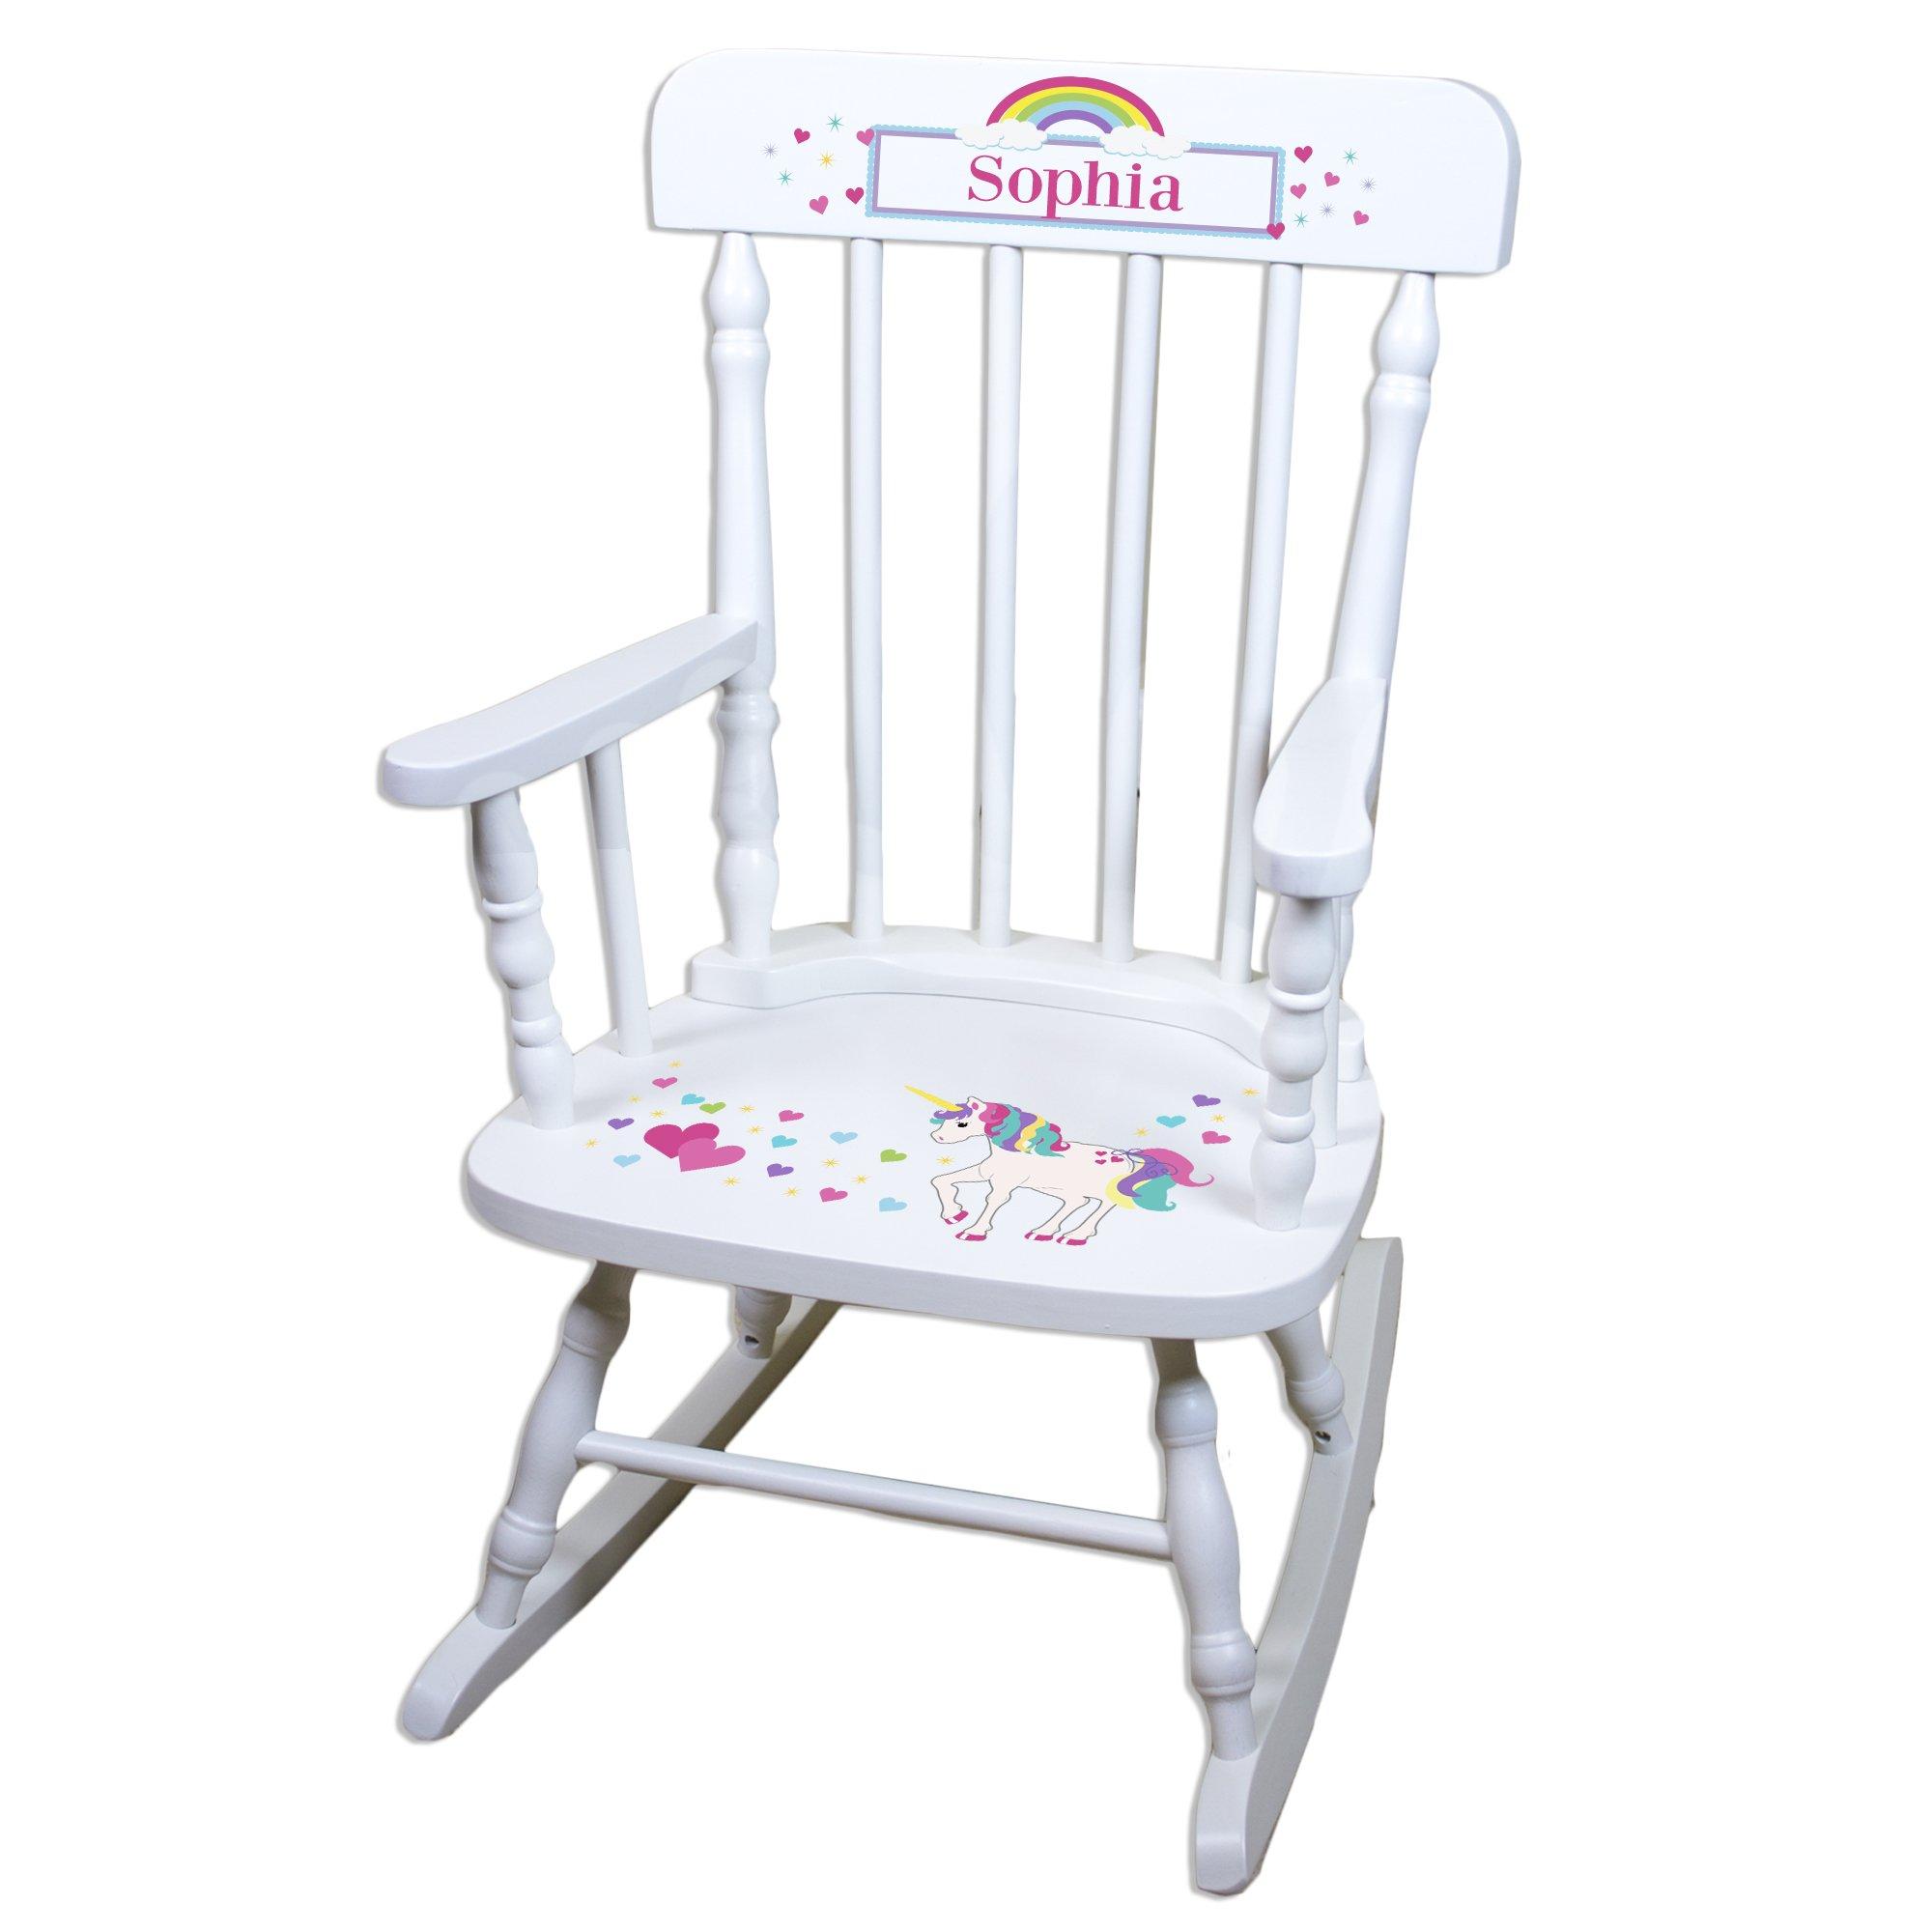 Children's Personalized White Unicorn Rocking Chair